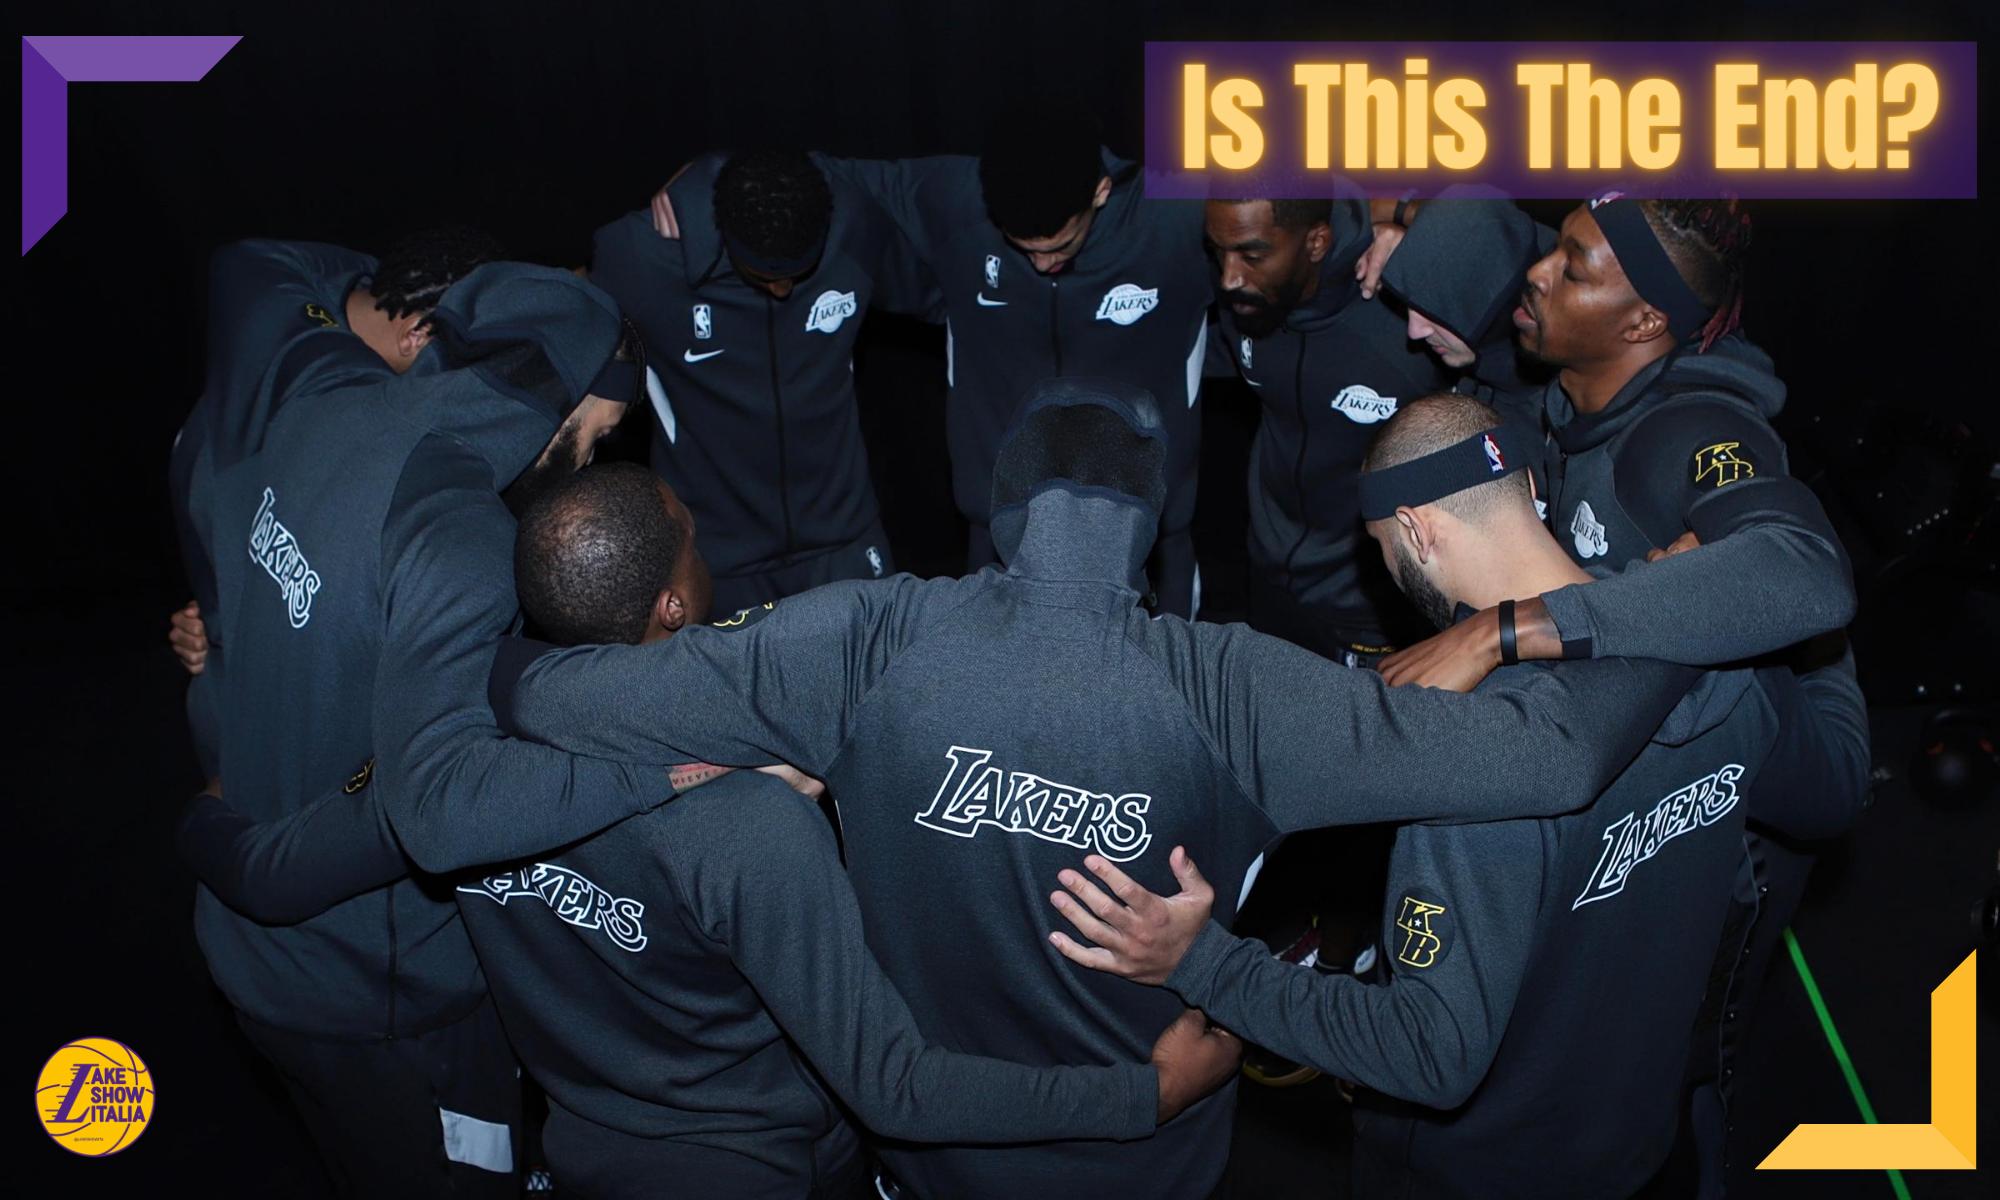 Los Angeles Lakers v Portland Trail Blazers - Game Four (Jim Poorten, NBAE via Getty Images)